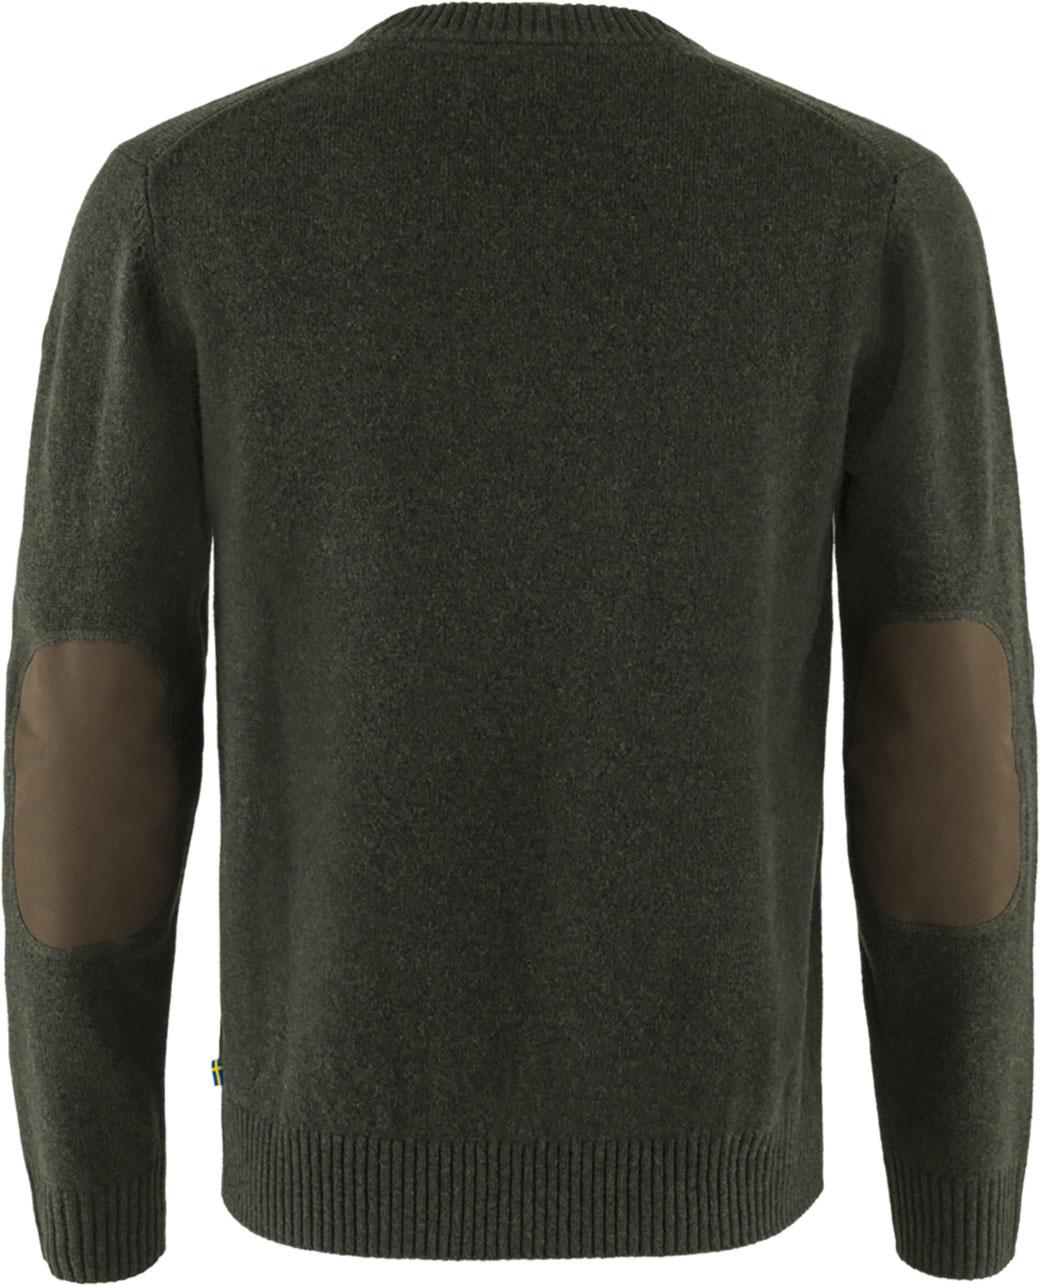 Fjällräven Övik Round-neck Sweater M Dark Olive-2